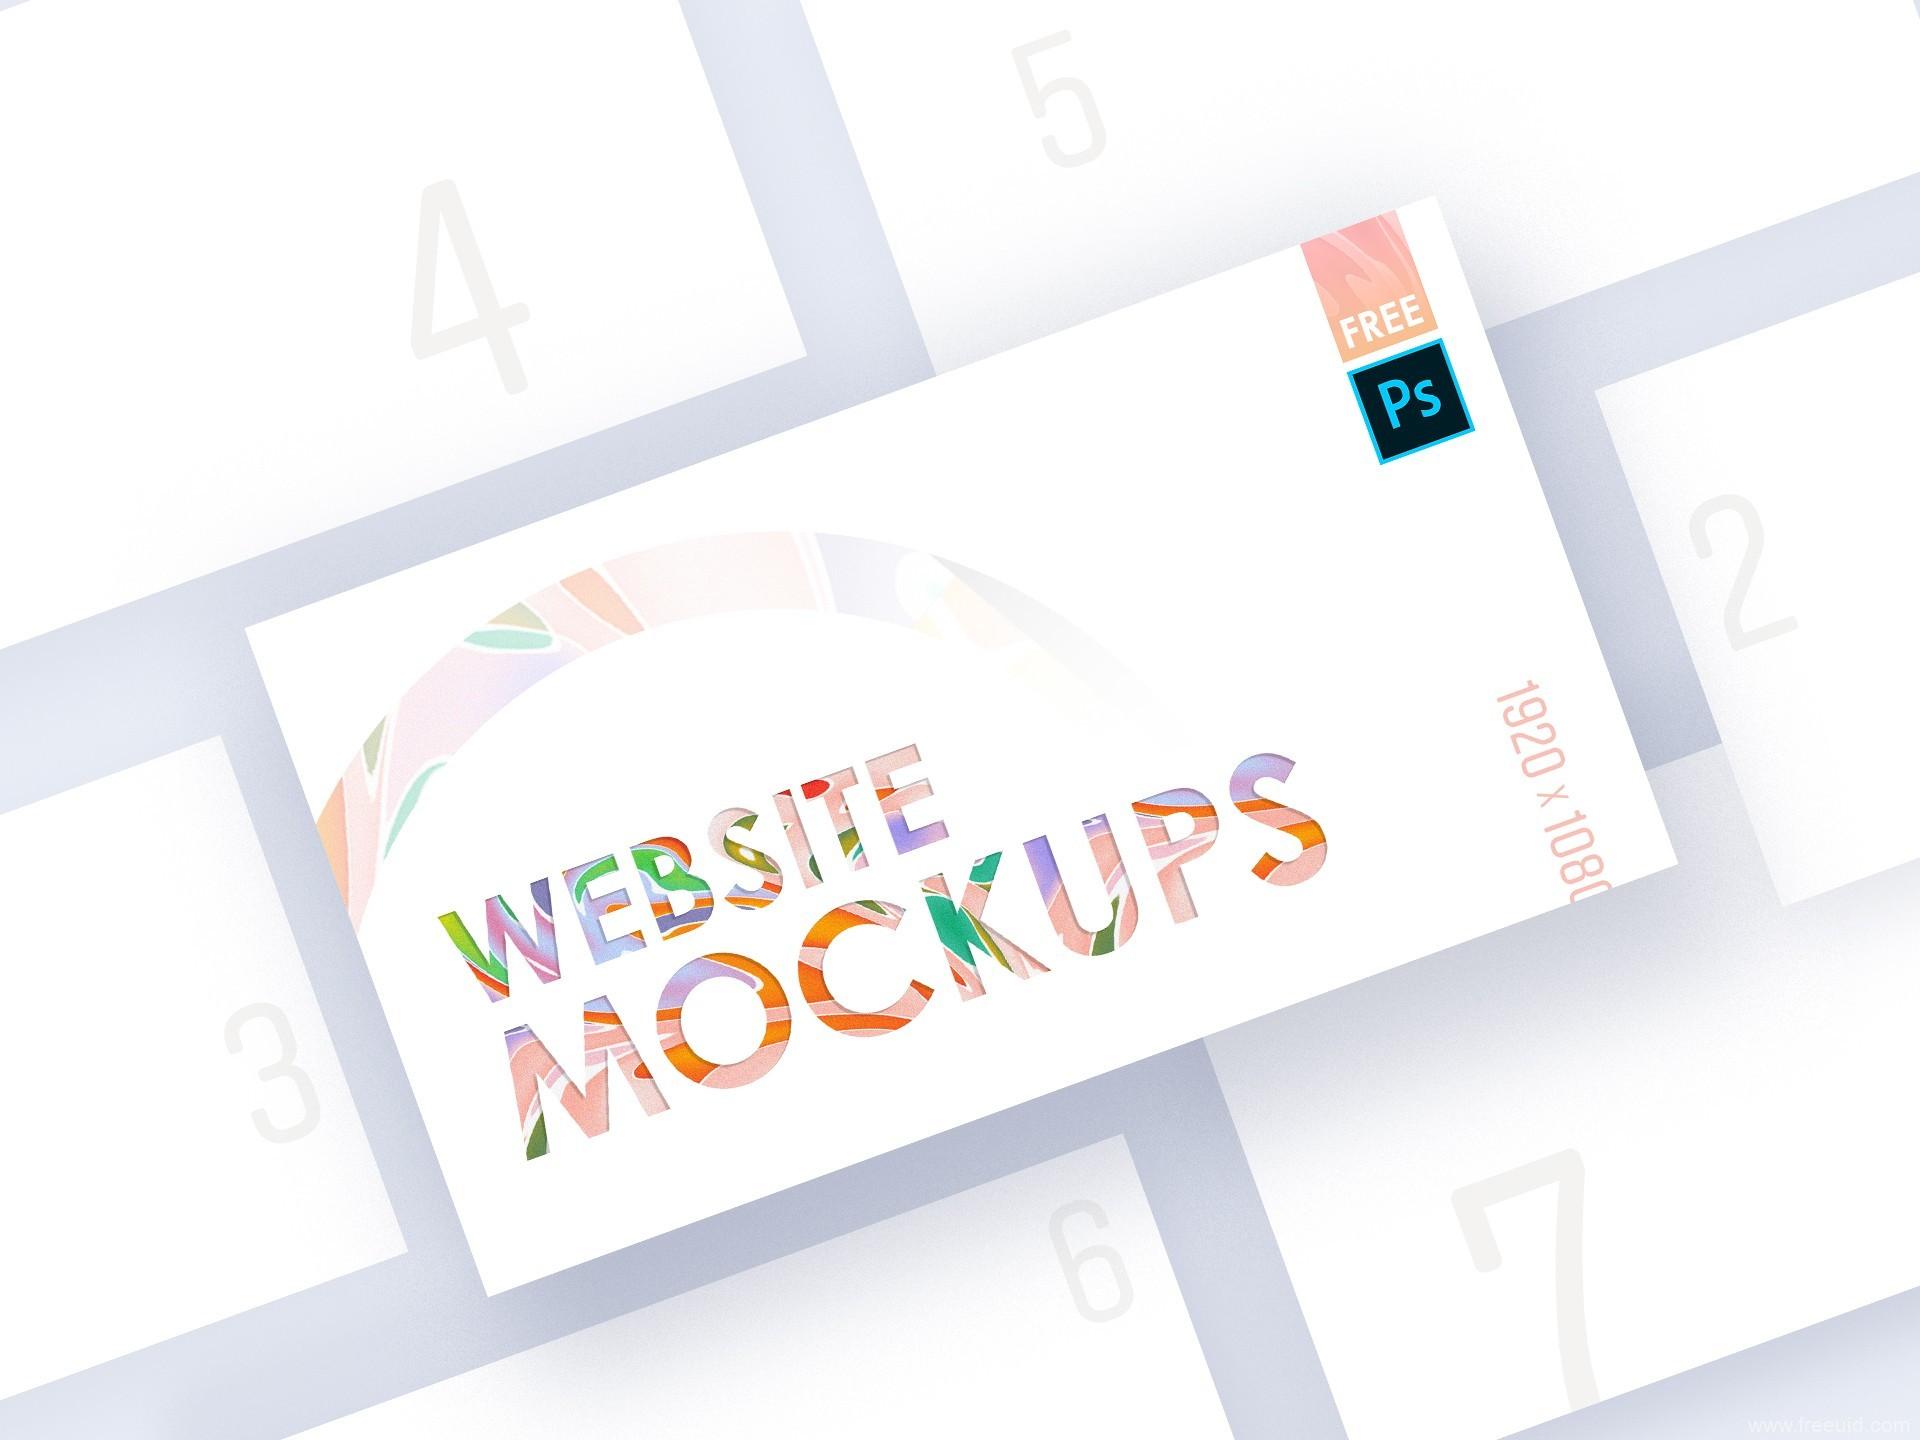 Website Mockups样机展示模板psd源文件下载